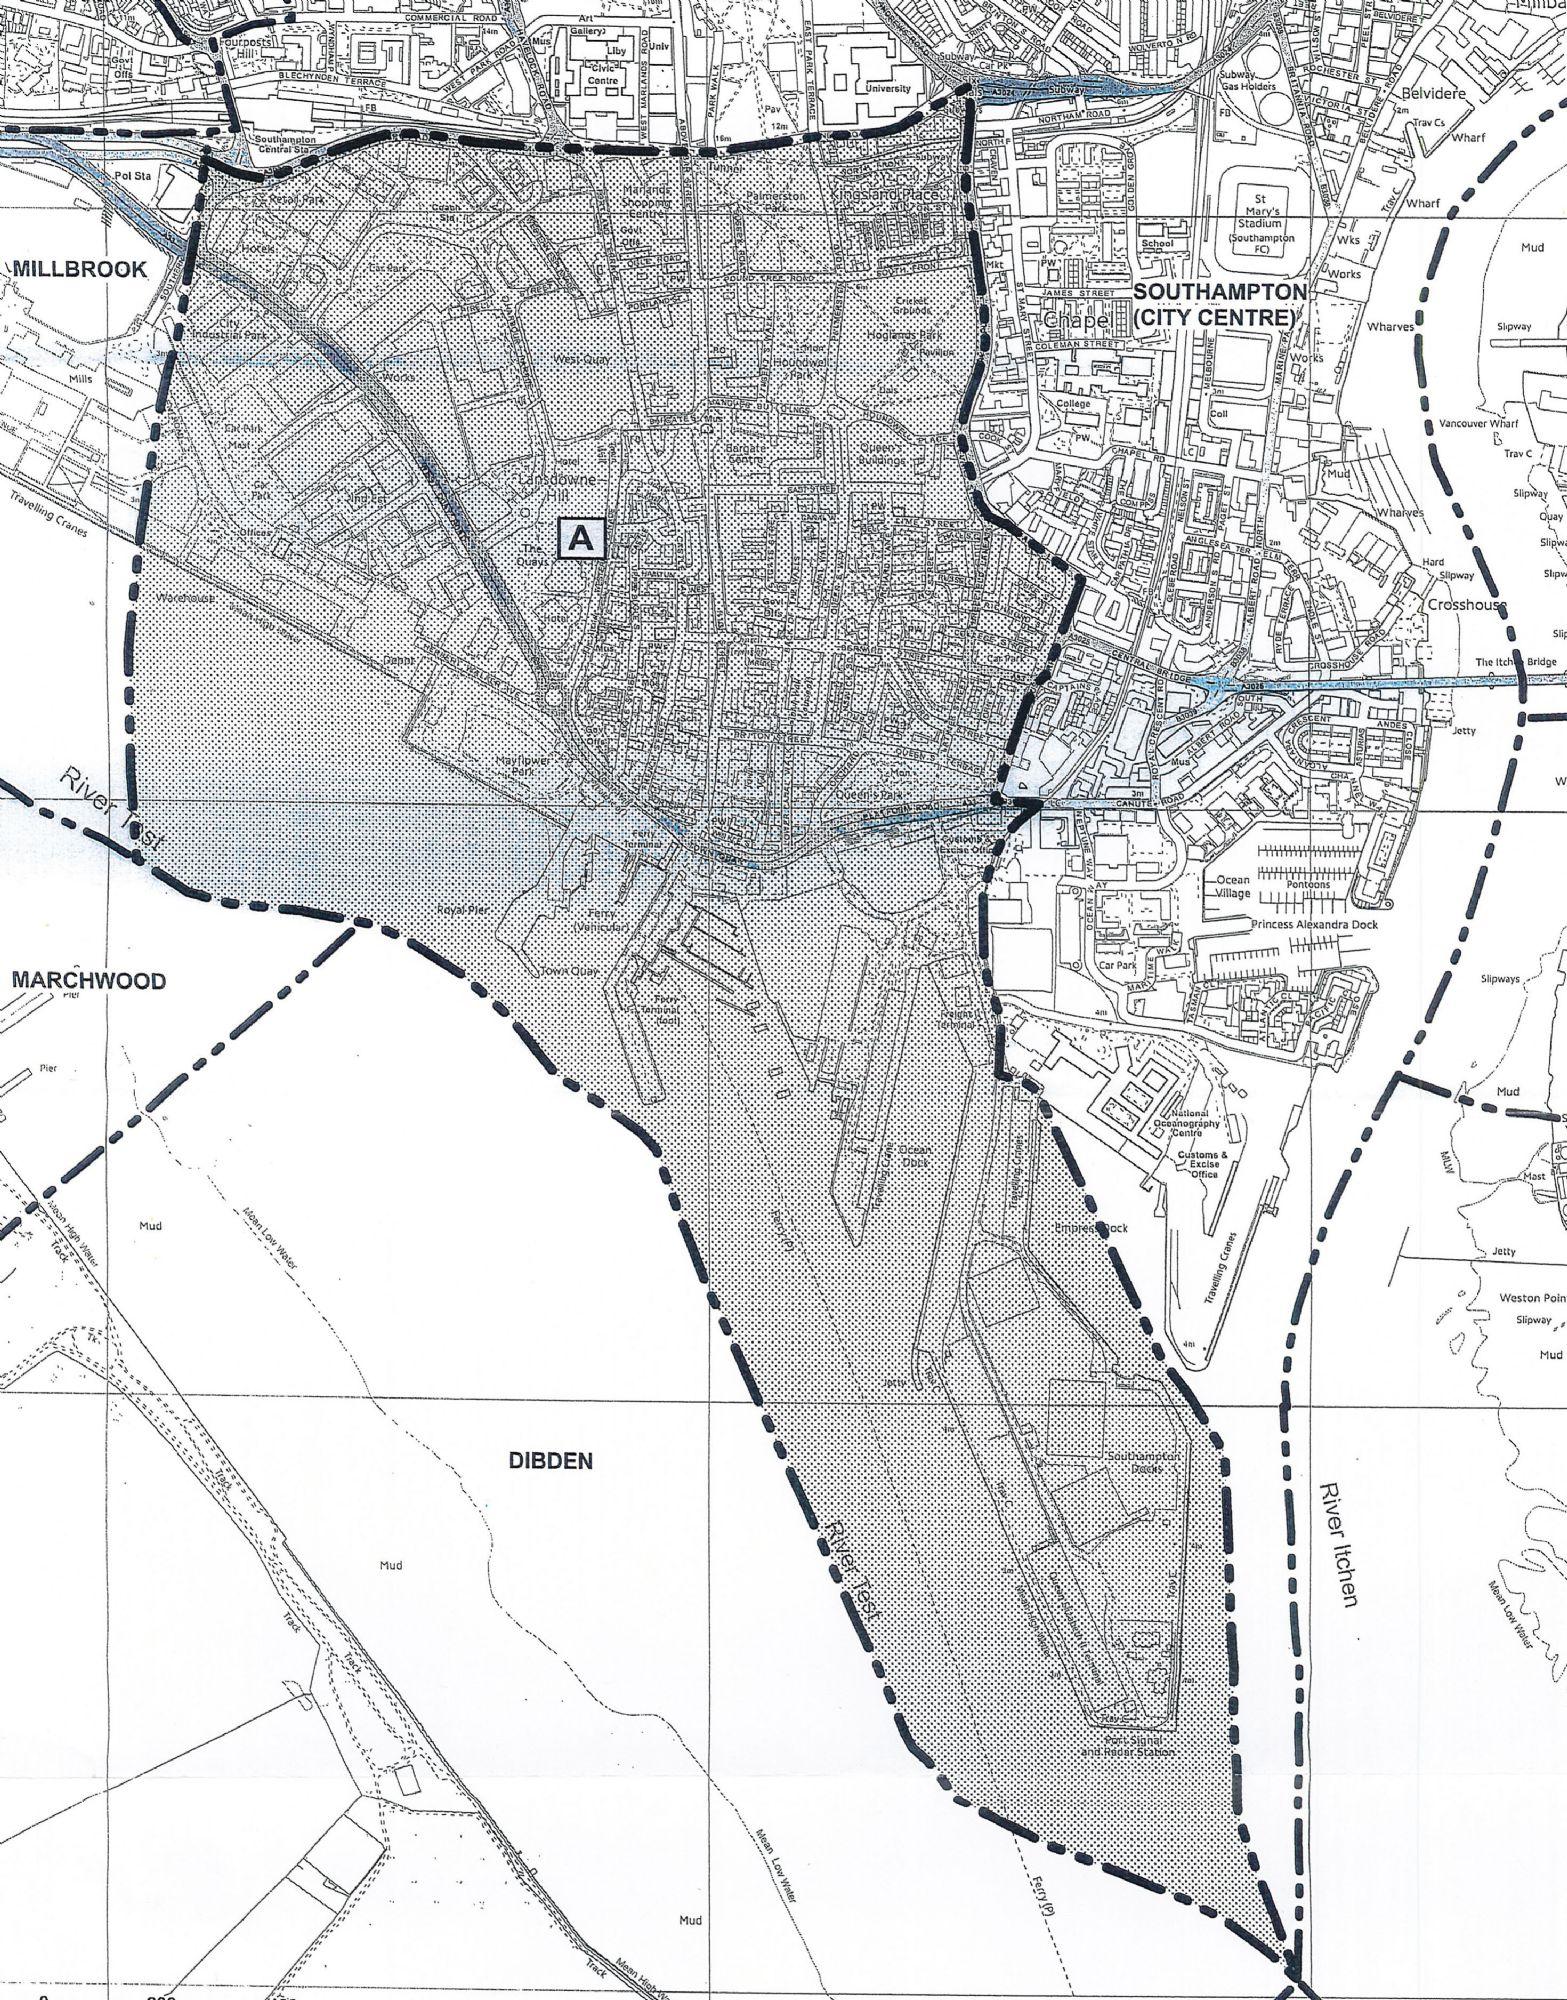 St Michael's Parish Boundary